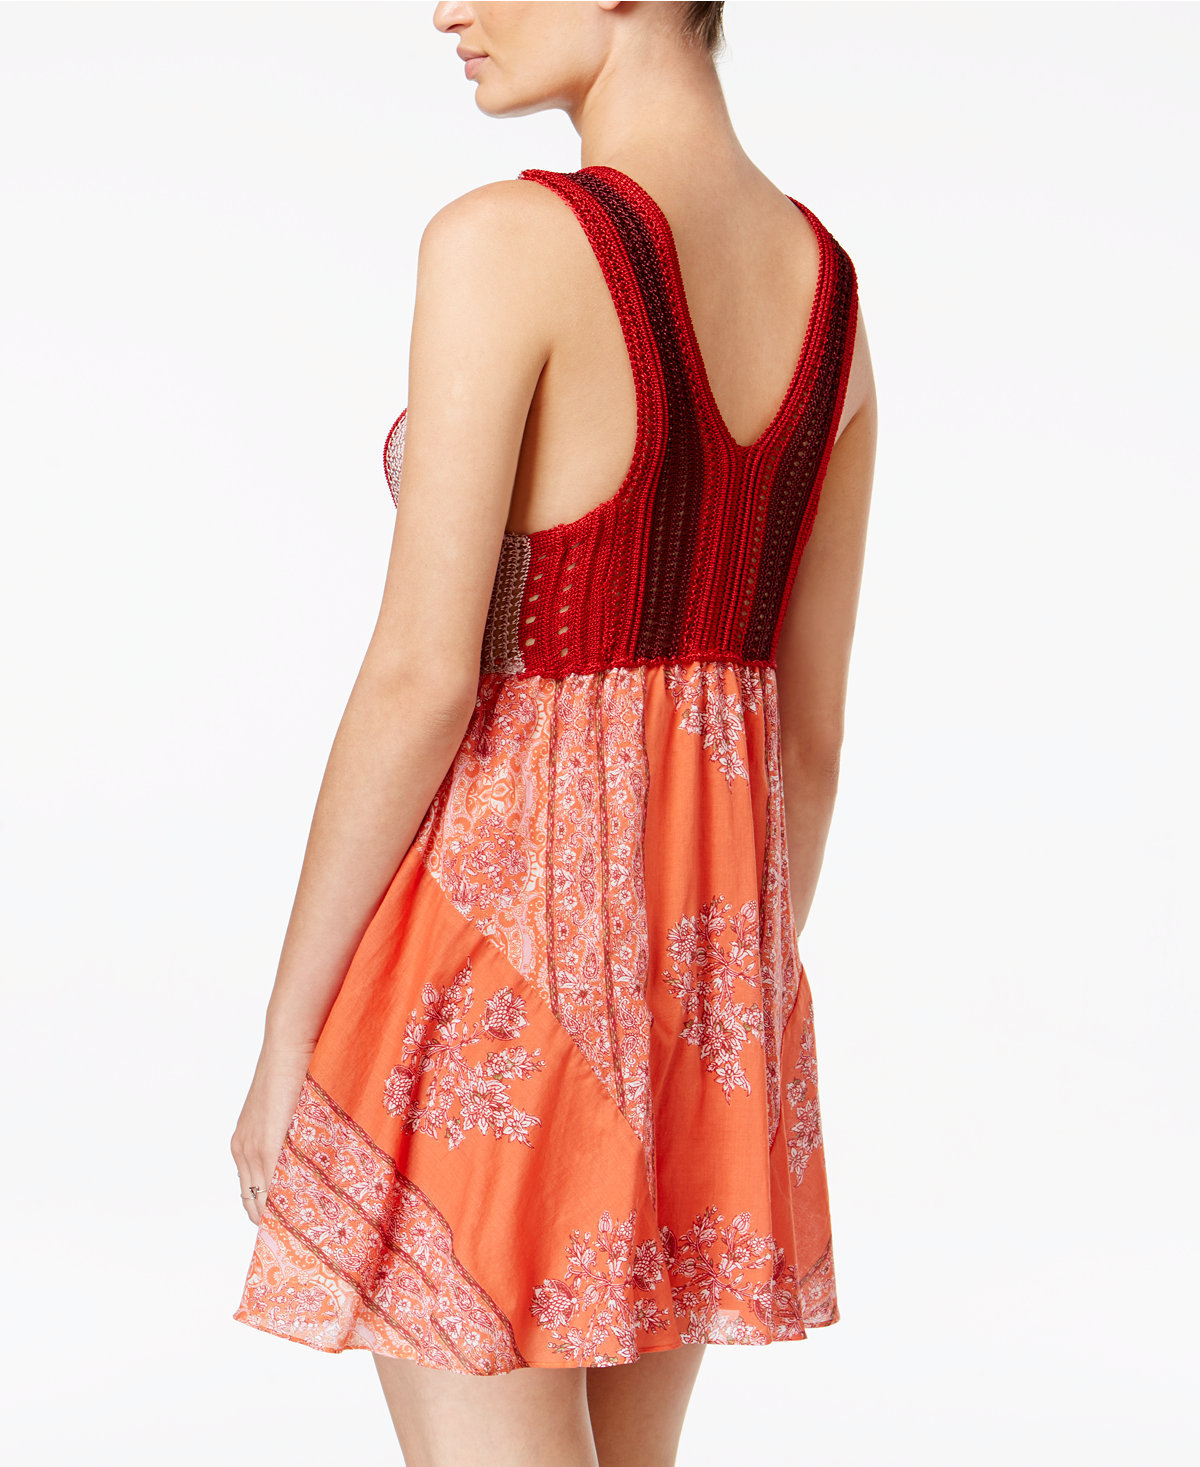 ddb161562a55 Free People Katies Mini Dress: Crochet Bodice: Red Combo: SMALL: NWT: